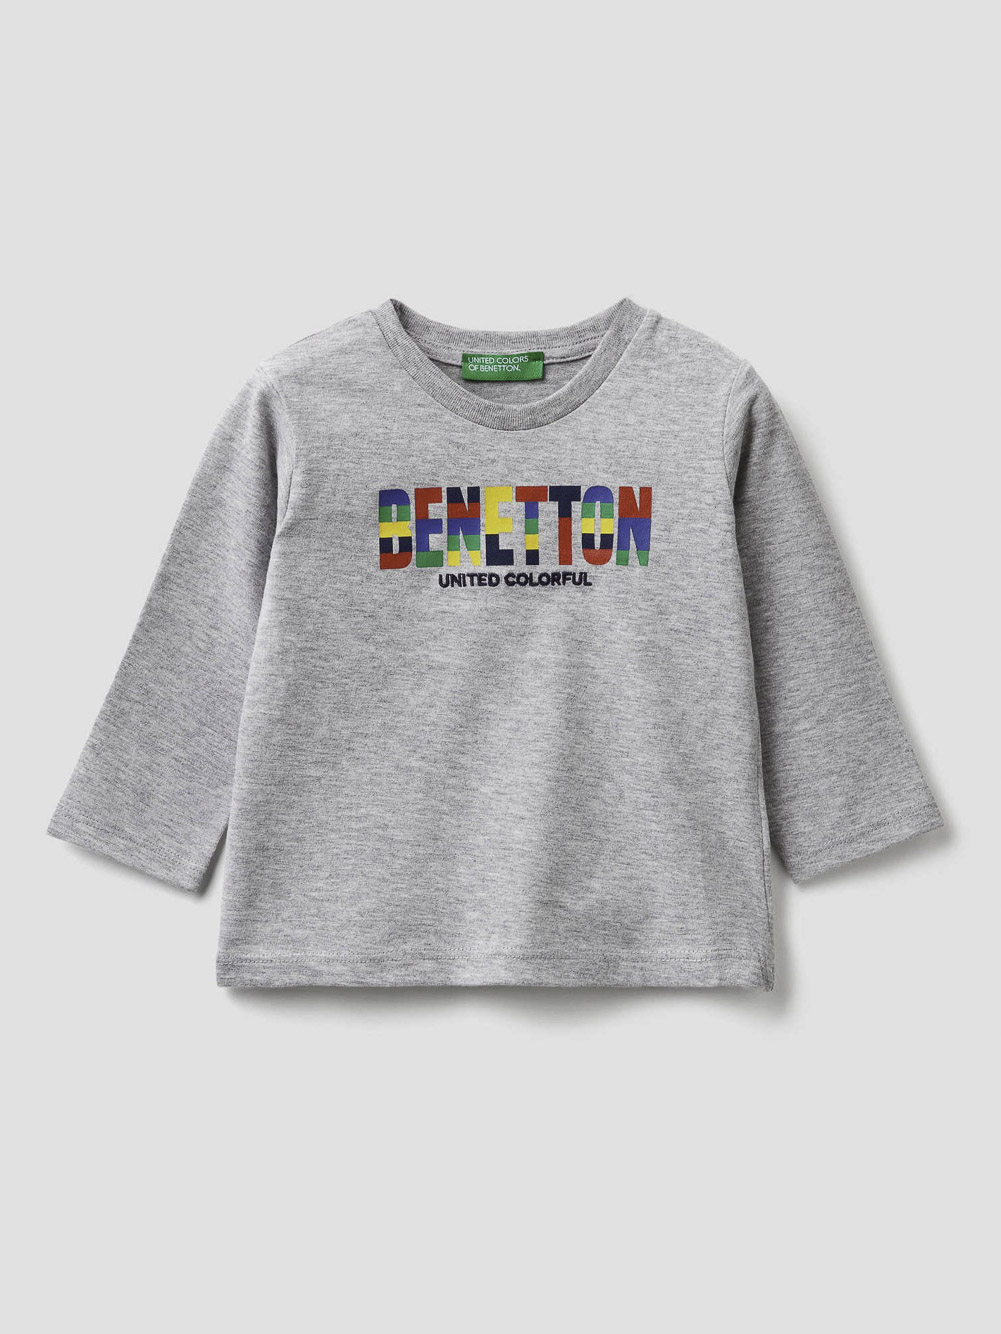 012 BENETTON T-shirt με λογότυπο 3ATNC14W1 20A501